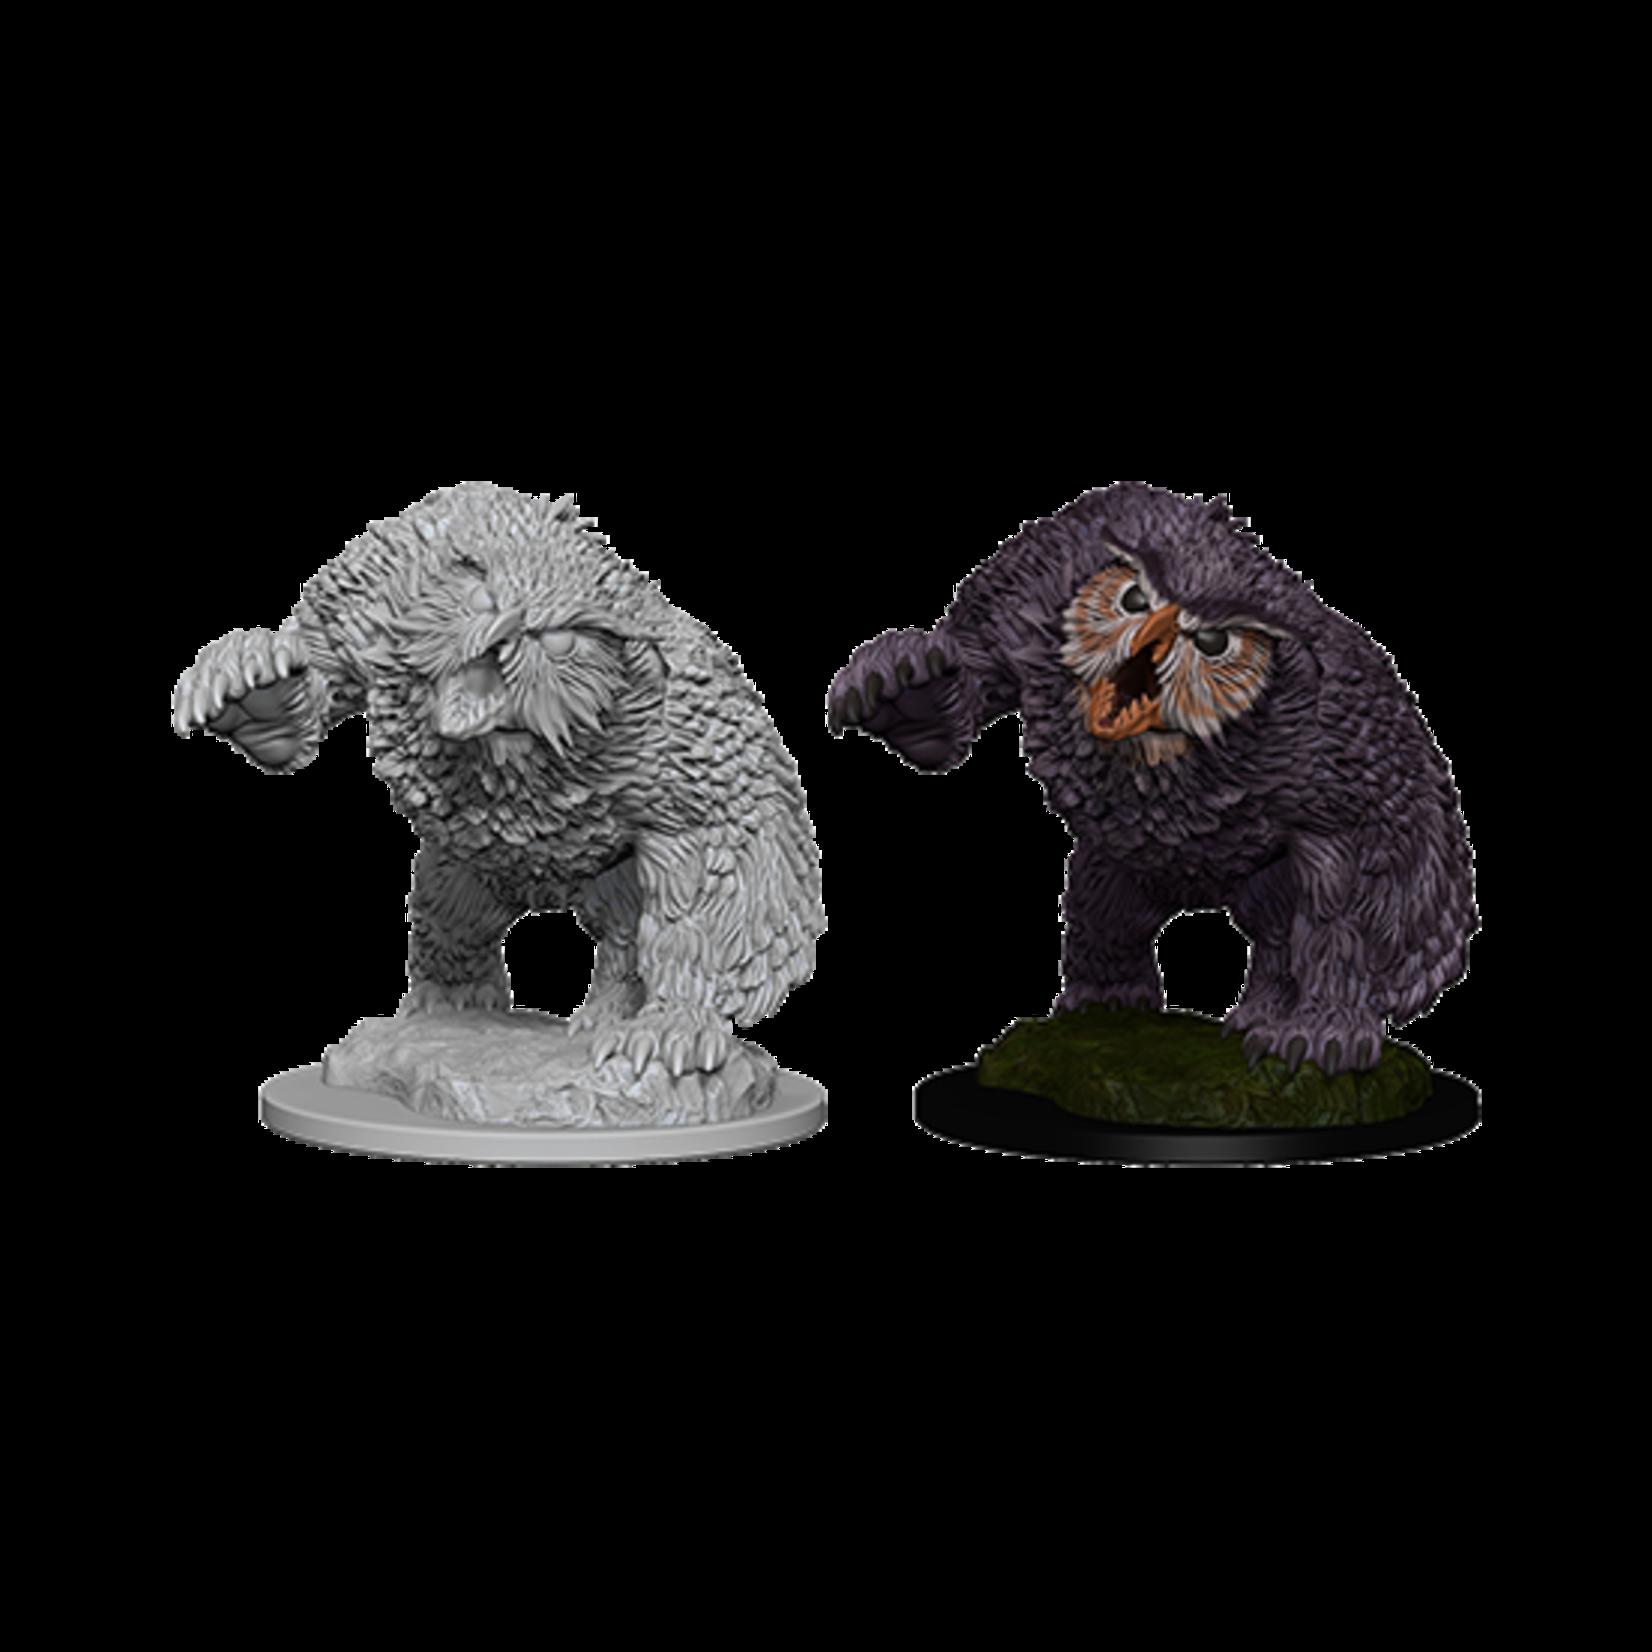 WizKids D&D Nolzur's Marvelous Miniatures: Owlbear (W5)